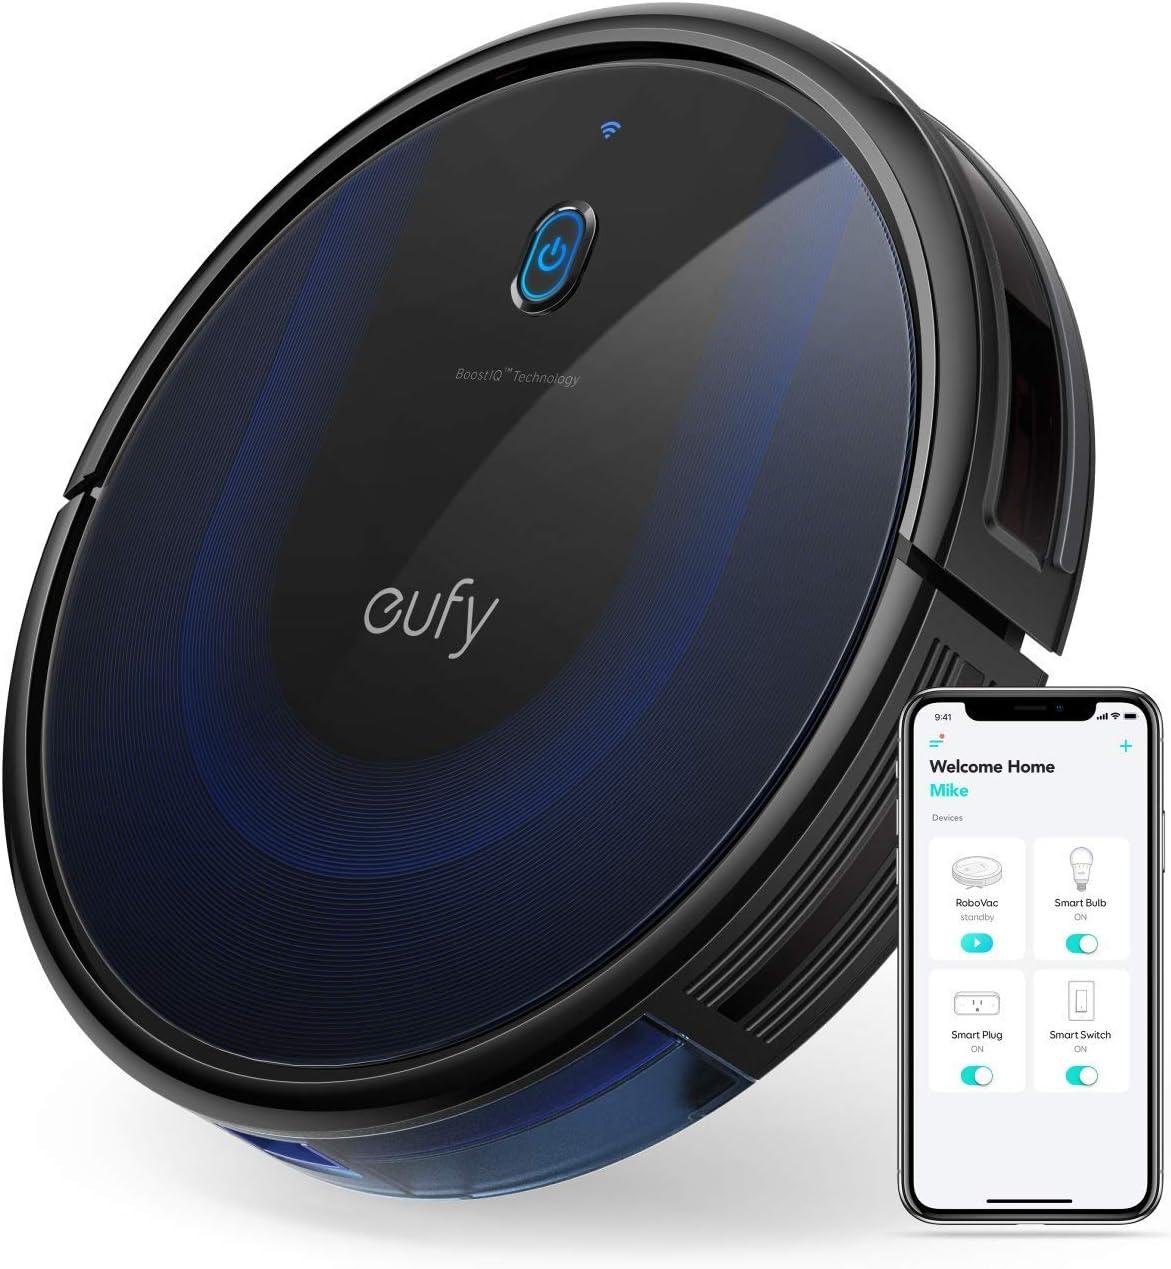 eufy [BoostIQ] RoboVac 15C MAX, Wi-Fi Connected Robot Vacuum Cleaner, Super-Thin, 2000Pa Suction, Quiet, Self-Charging Robotic Vacuum Cleaner, Cleans Hard Floors to Medium-Pile Carpets